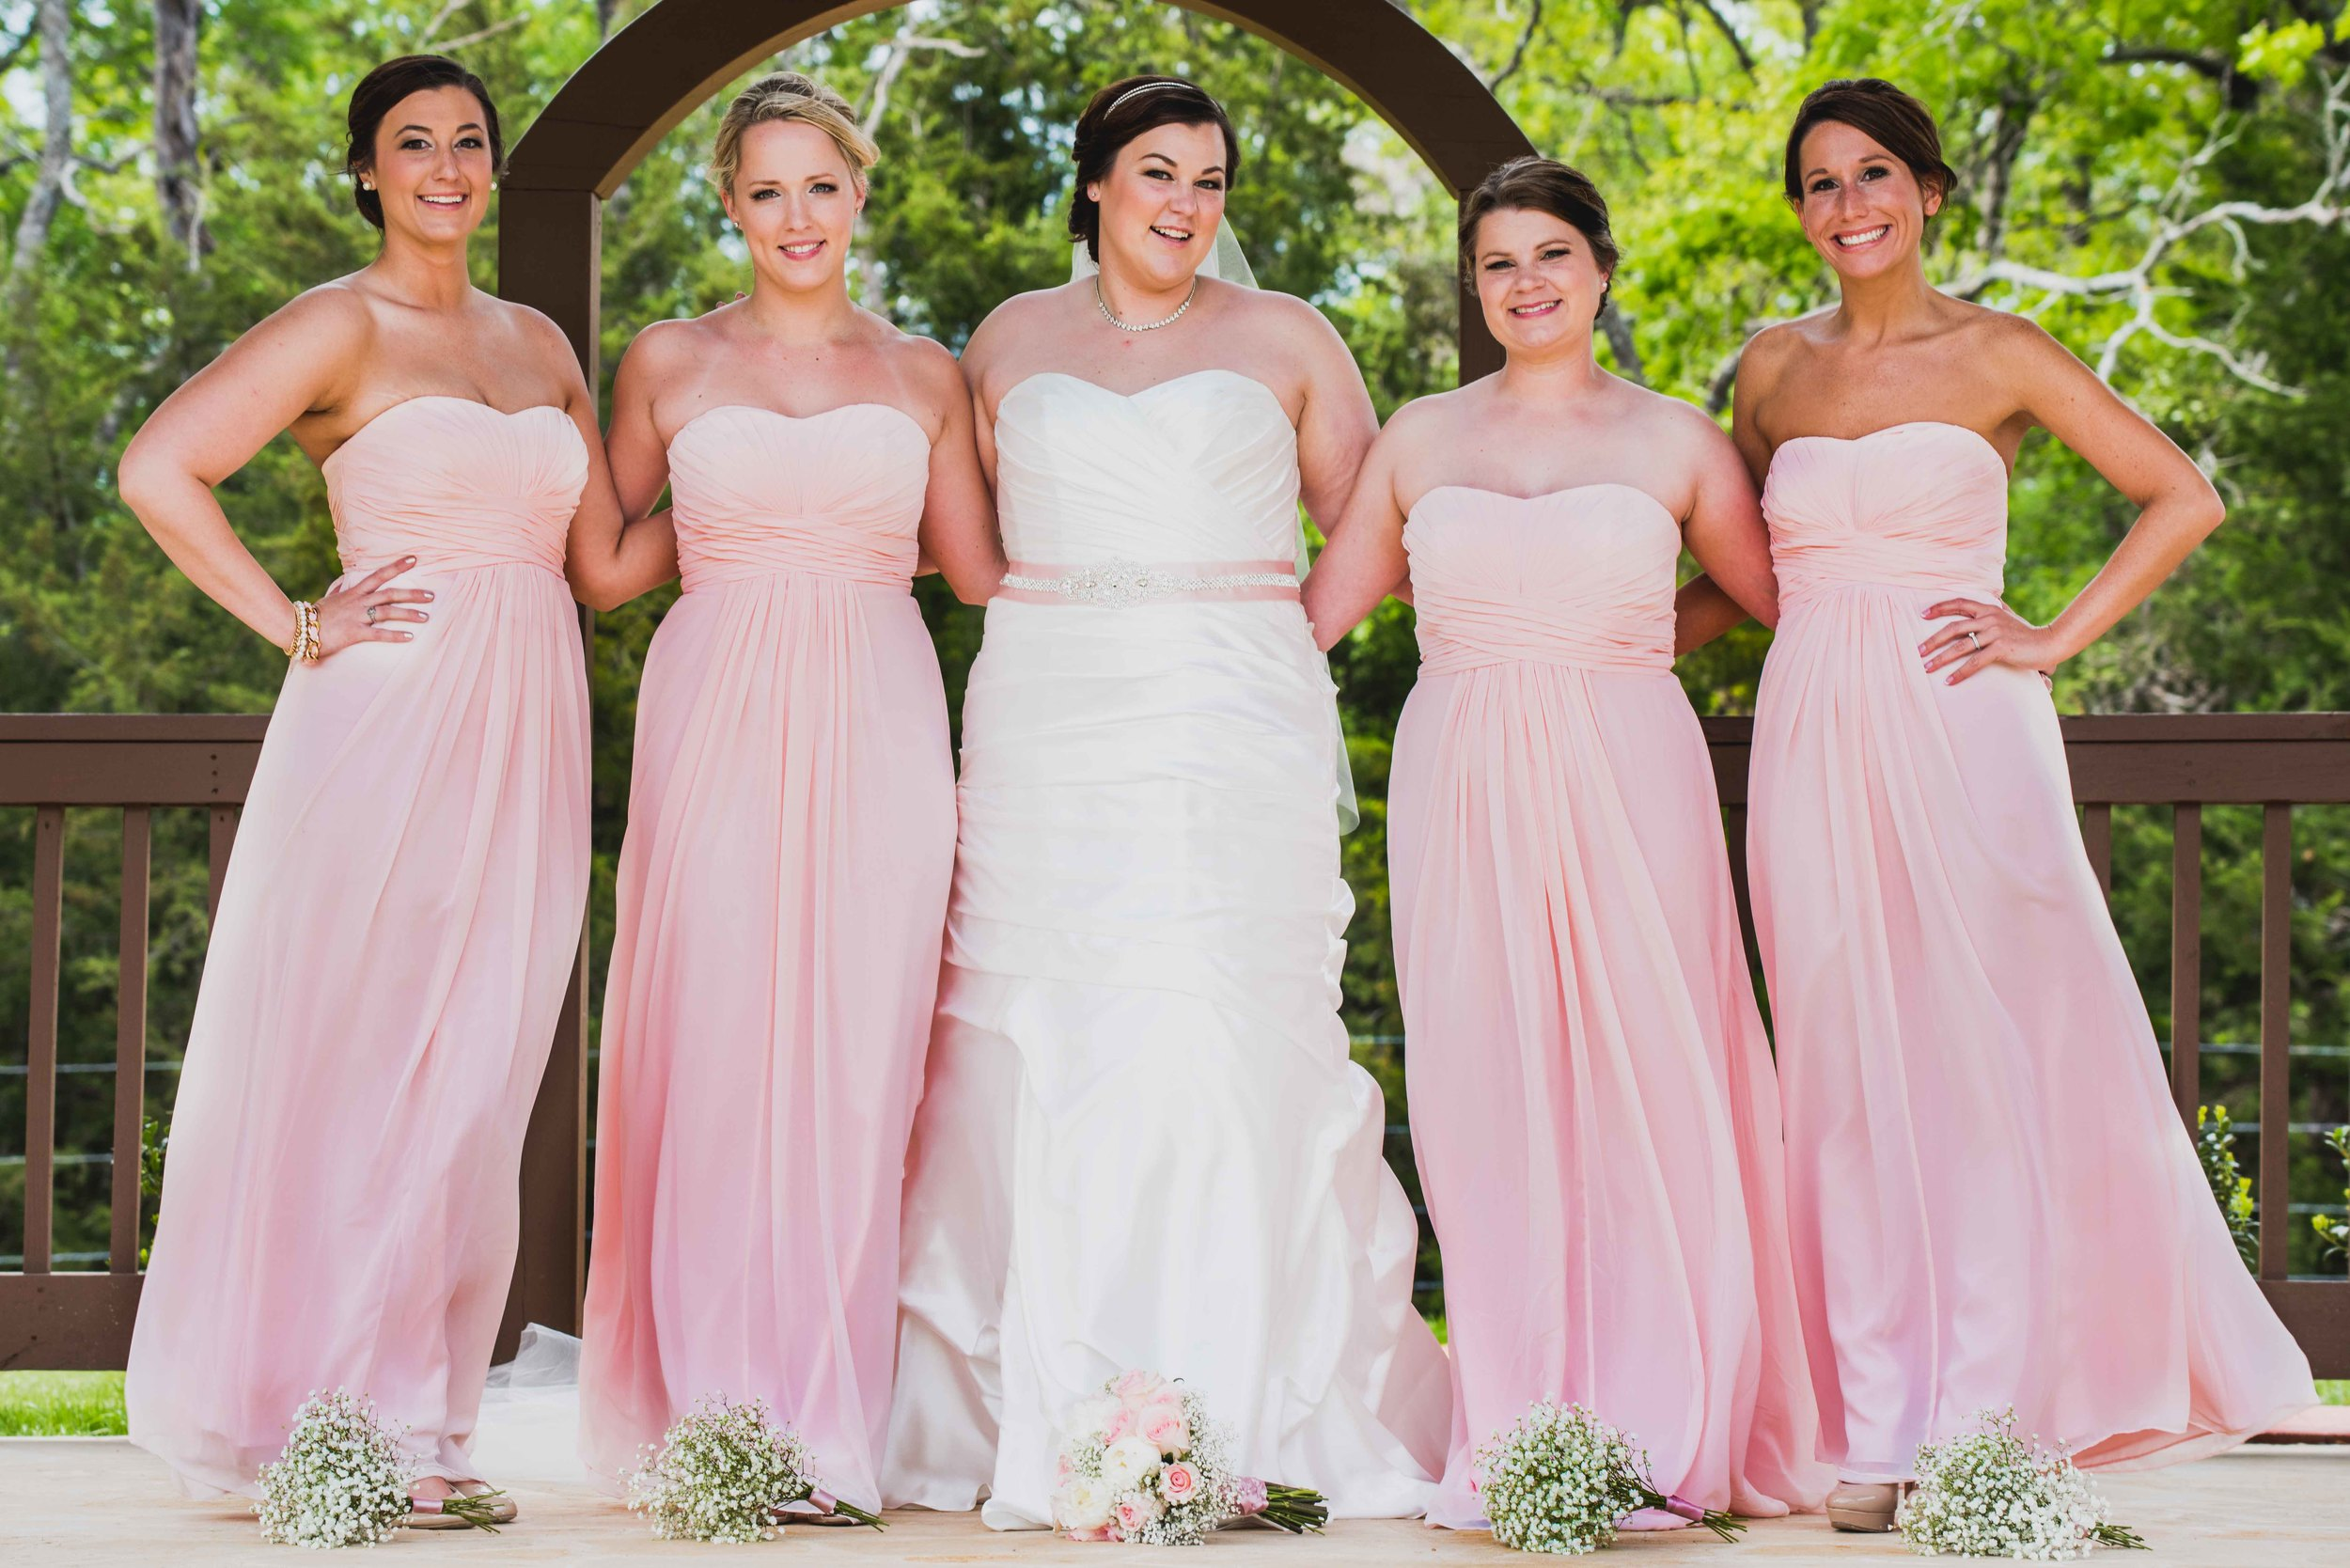 Dallas Wedding - Heritage Springs - Katie and Dustin - Bridesmaids